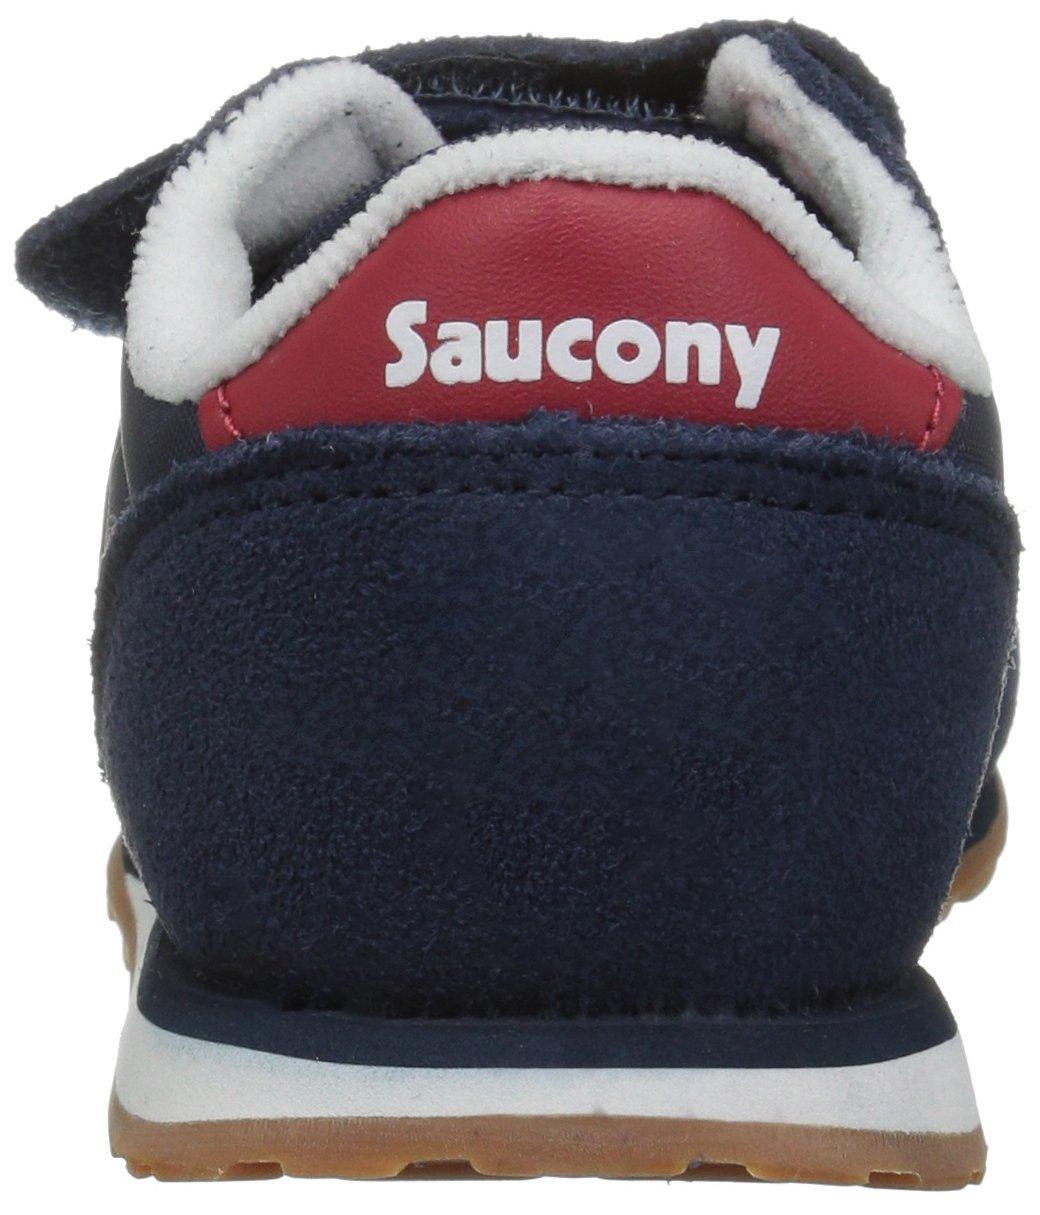 Saucony Jazz Hook & Loop Sneaker (Toddler/Little Kid), Navy/Red, 12 M US Little Kid by Saucony (Image #2)